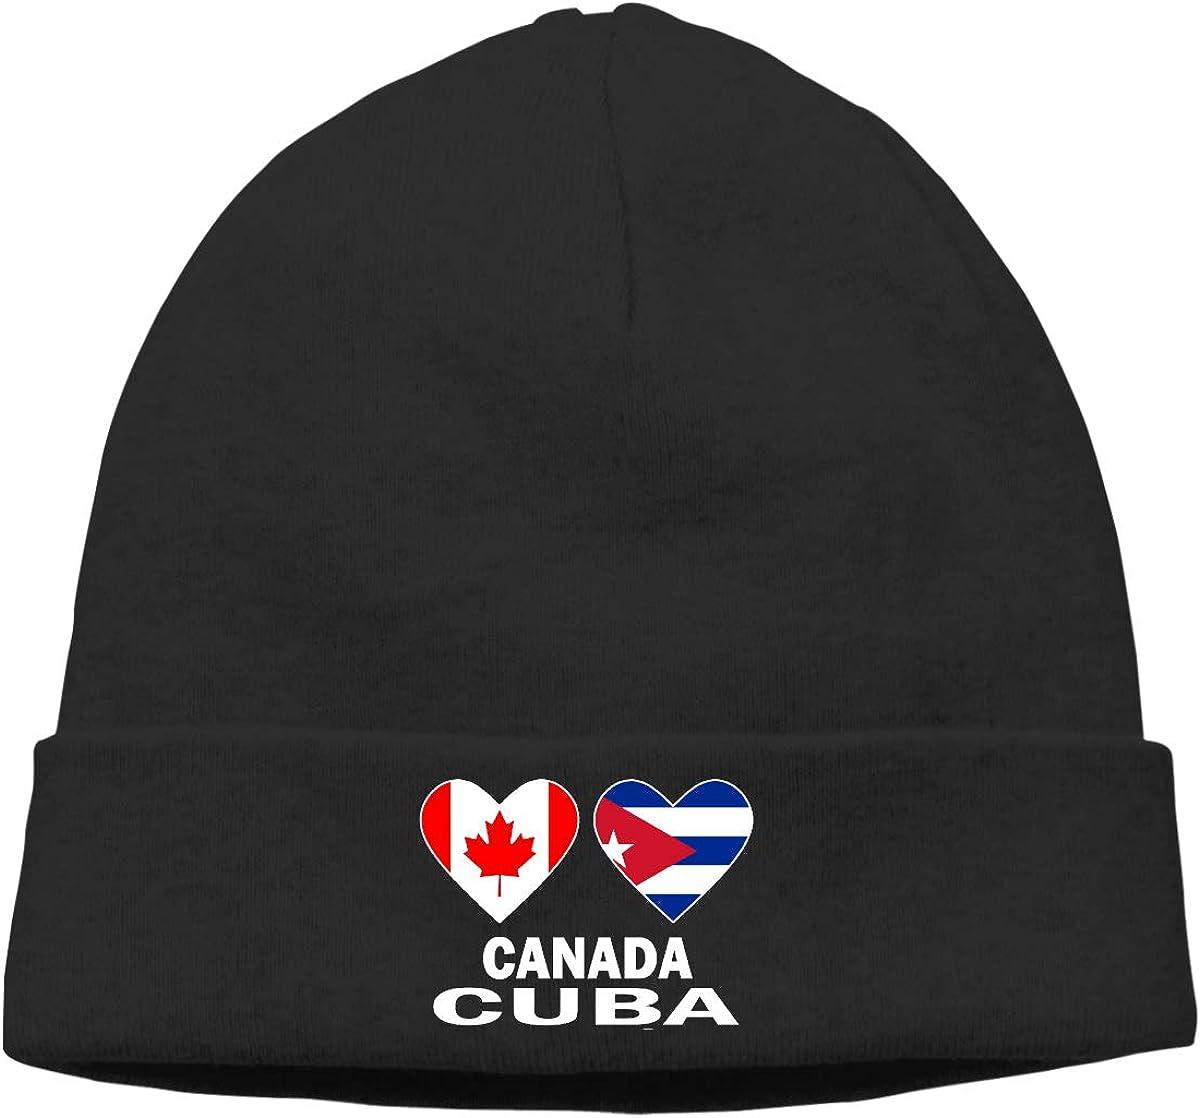 E6EP9E Canada Cuba Hearts Warm Skiing Skull Cap Mens Womens Snow Sports Thin Beanie